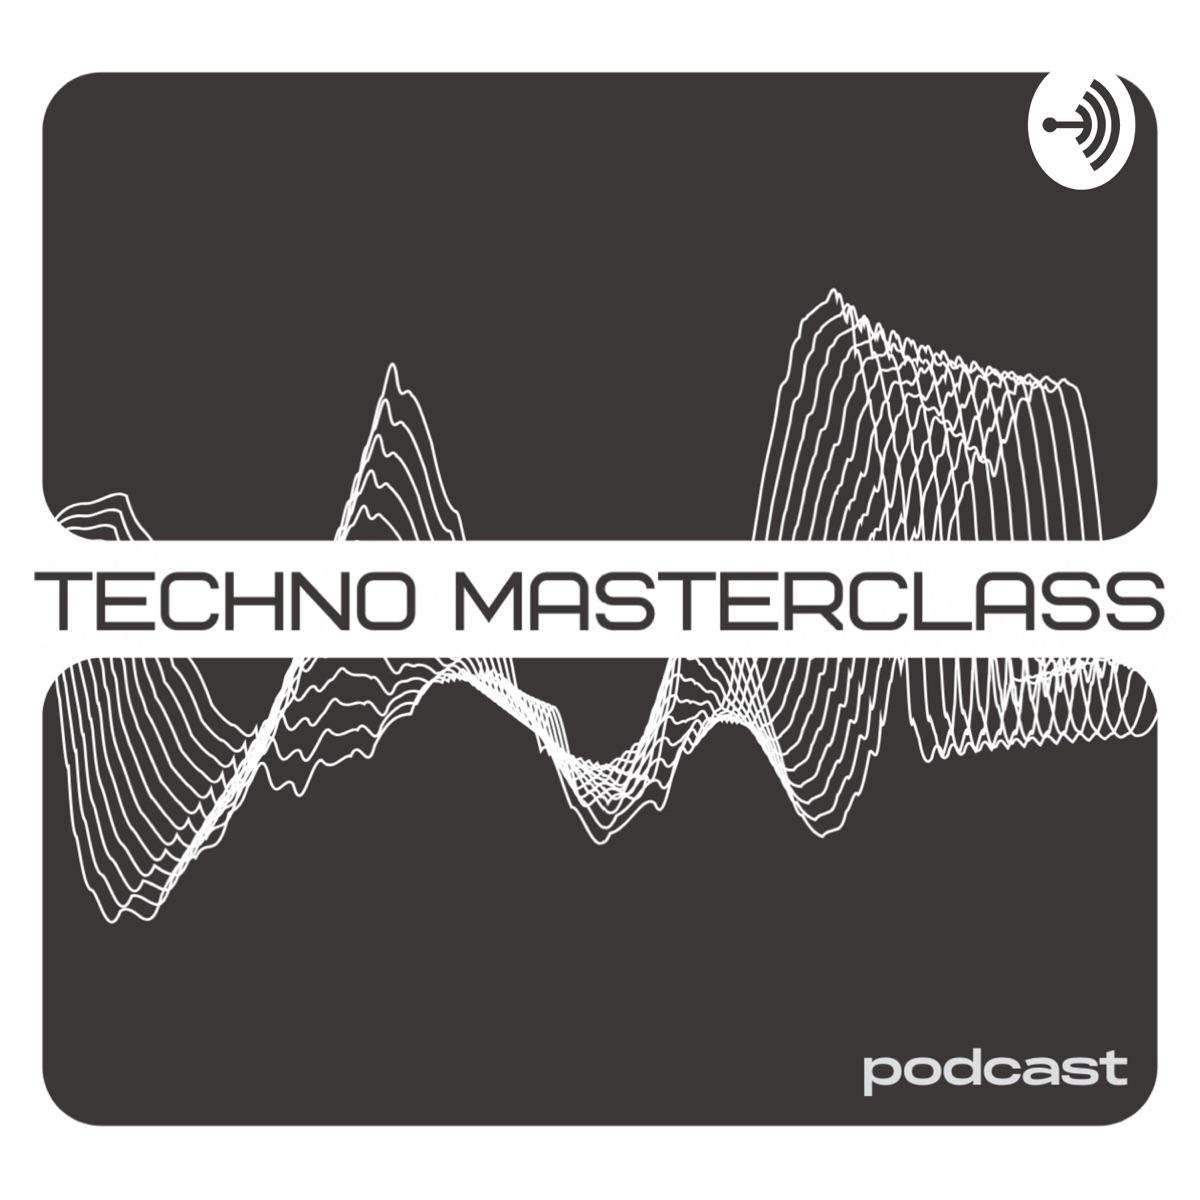 Techno Masterclass Podcast